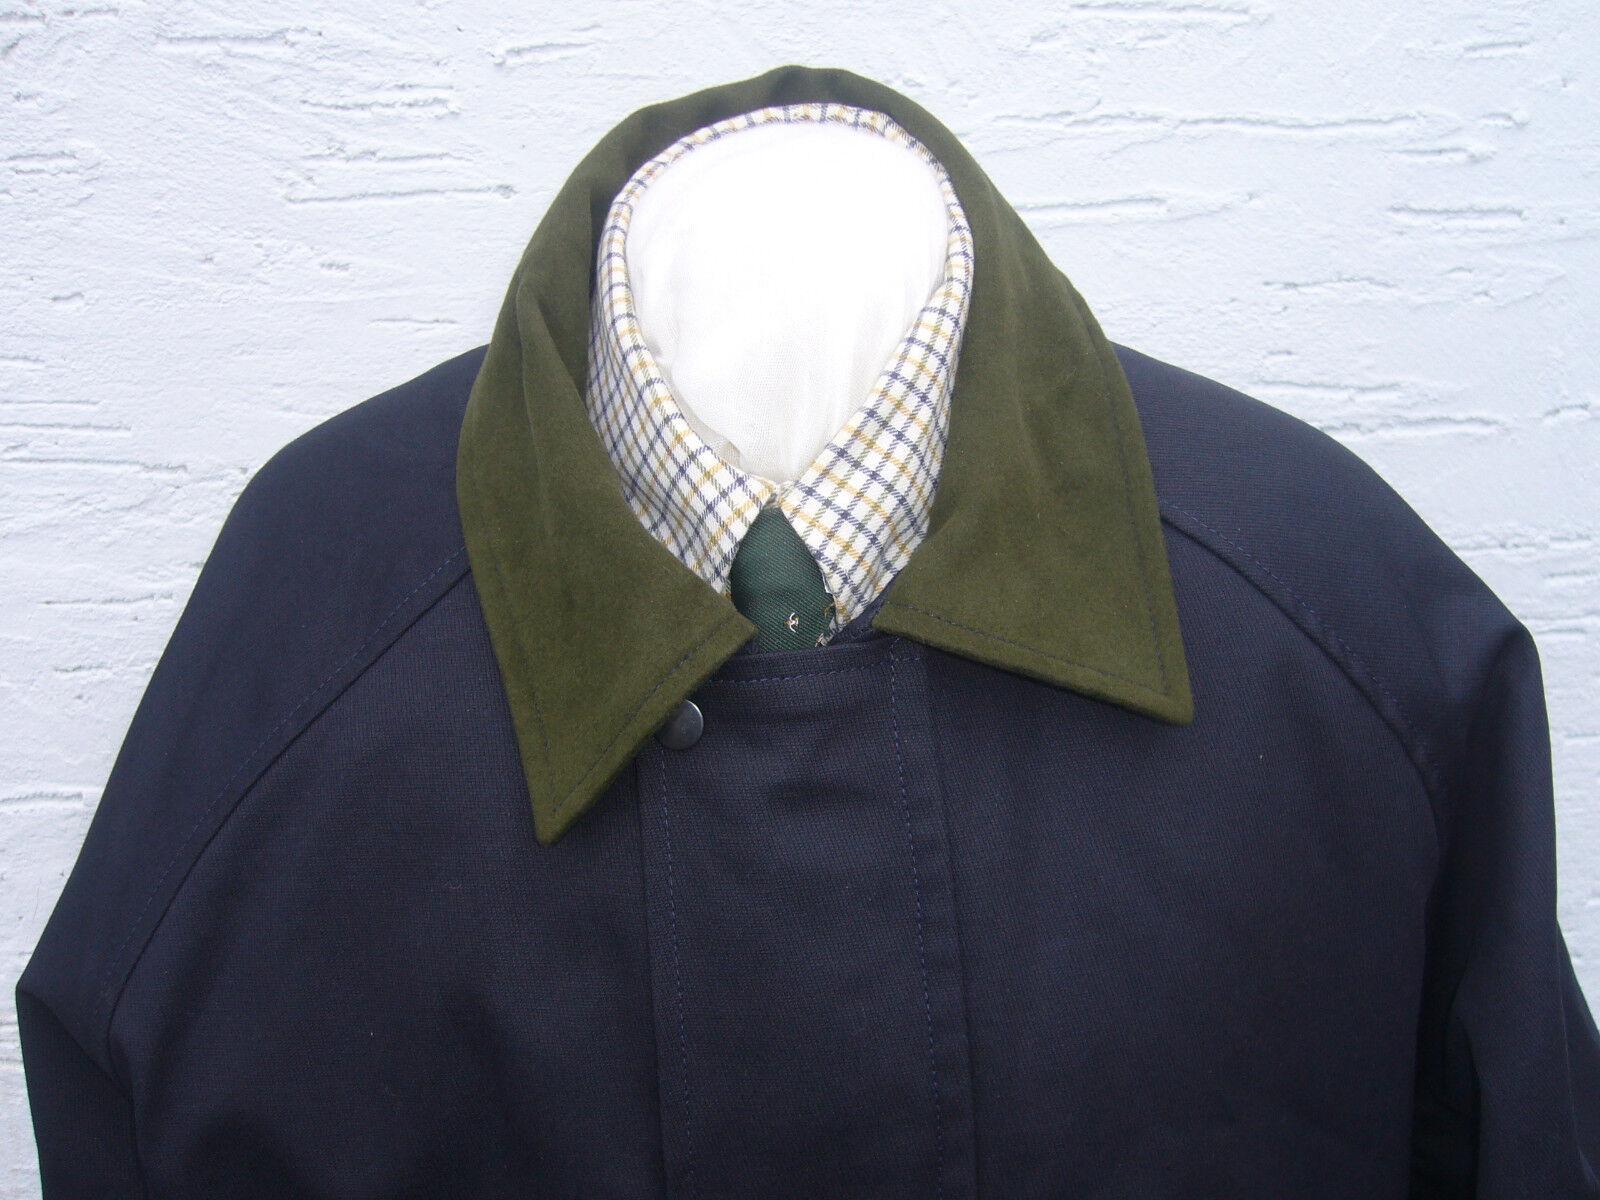 Veste imperméable poly coton taille med bleu marine marine marine tir marche countrywear new 174997